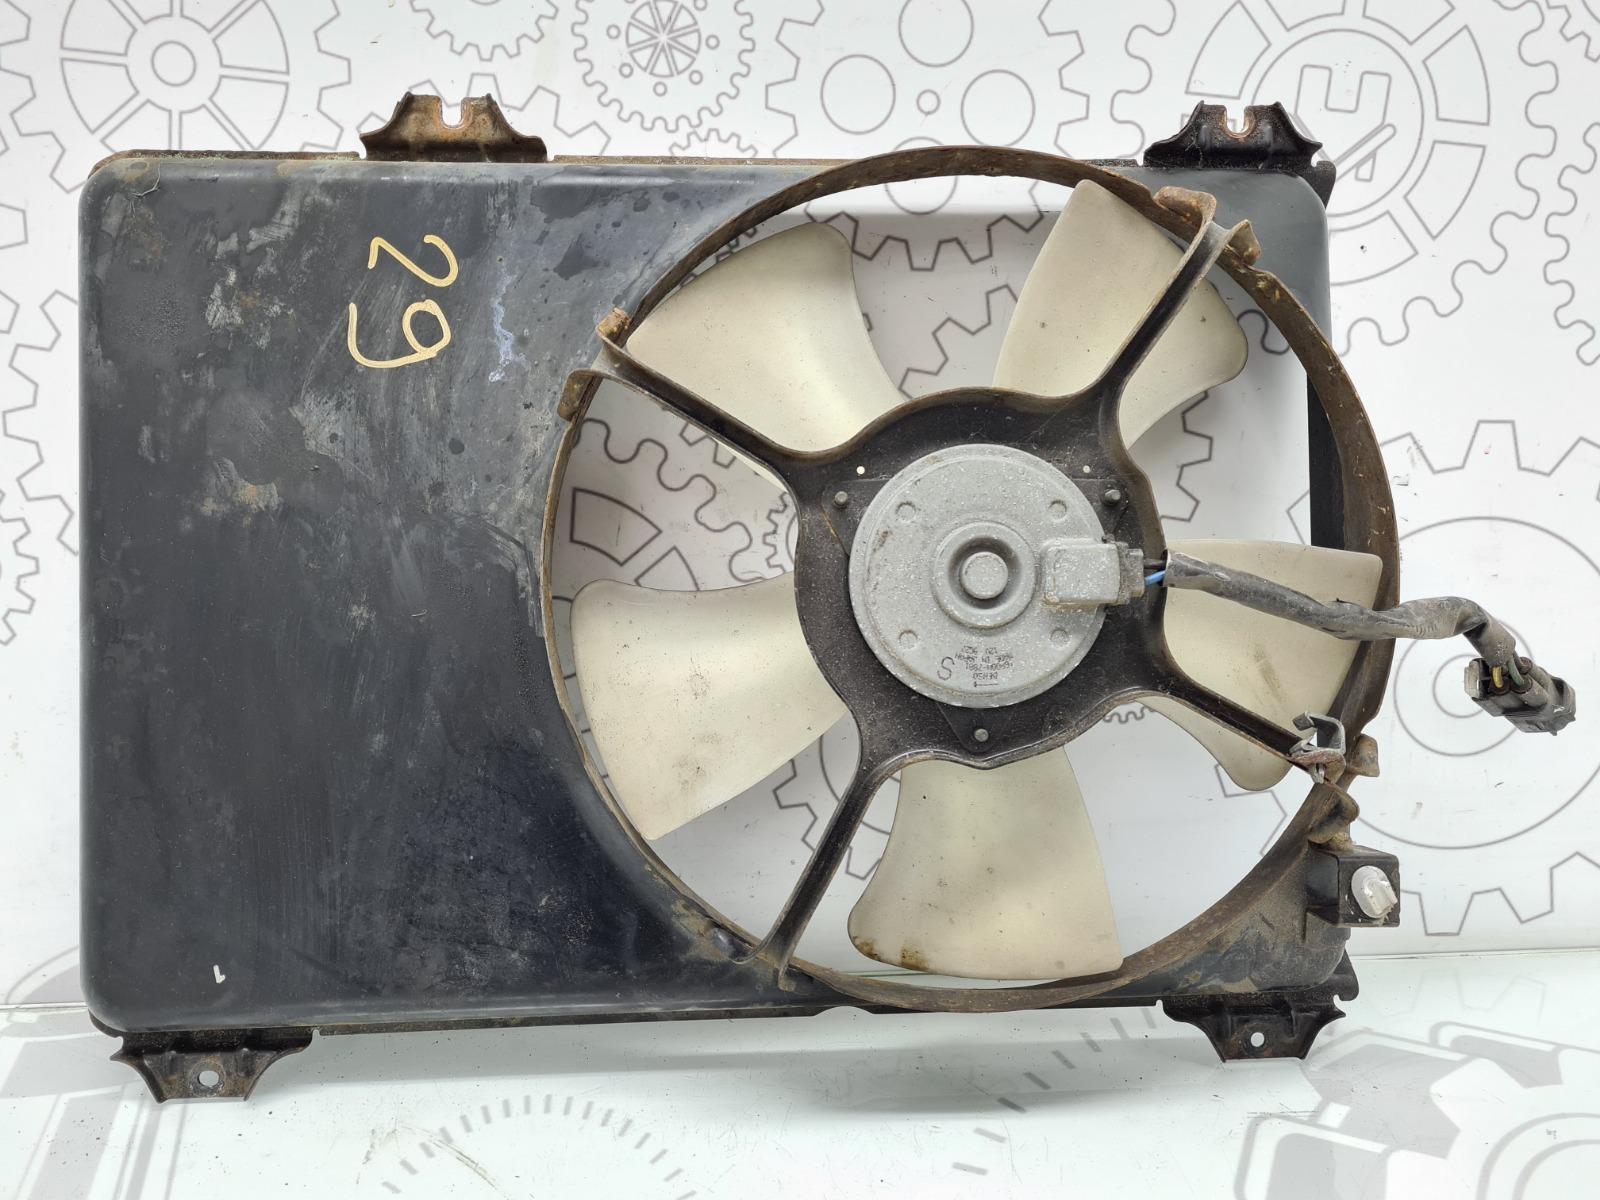 Вентилятор радиатора Suzuki Swift 1.3 I 2006 (б/у)